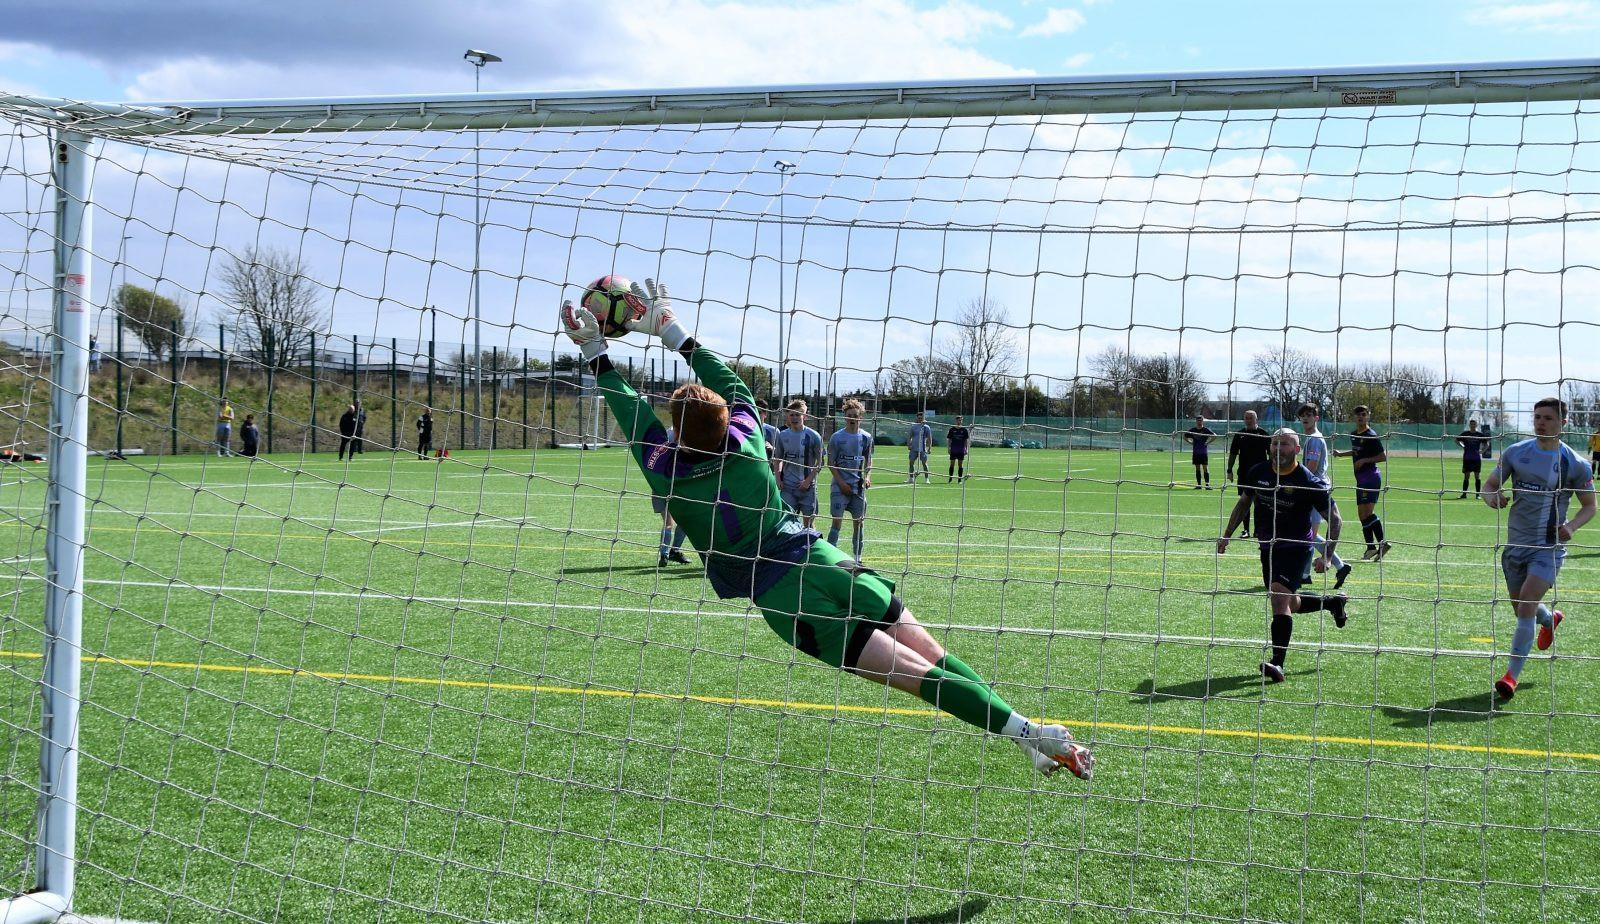 Workington-Development-v-Maryport-Athletic-Ben-Challis-38-SCOTT-PADEN-GALE-SAVE